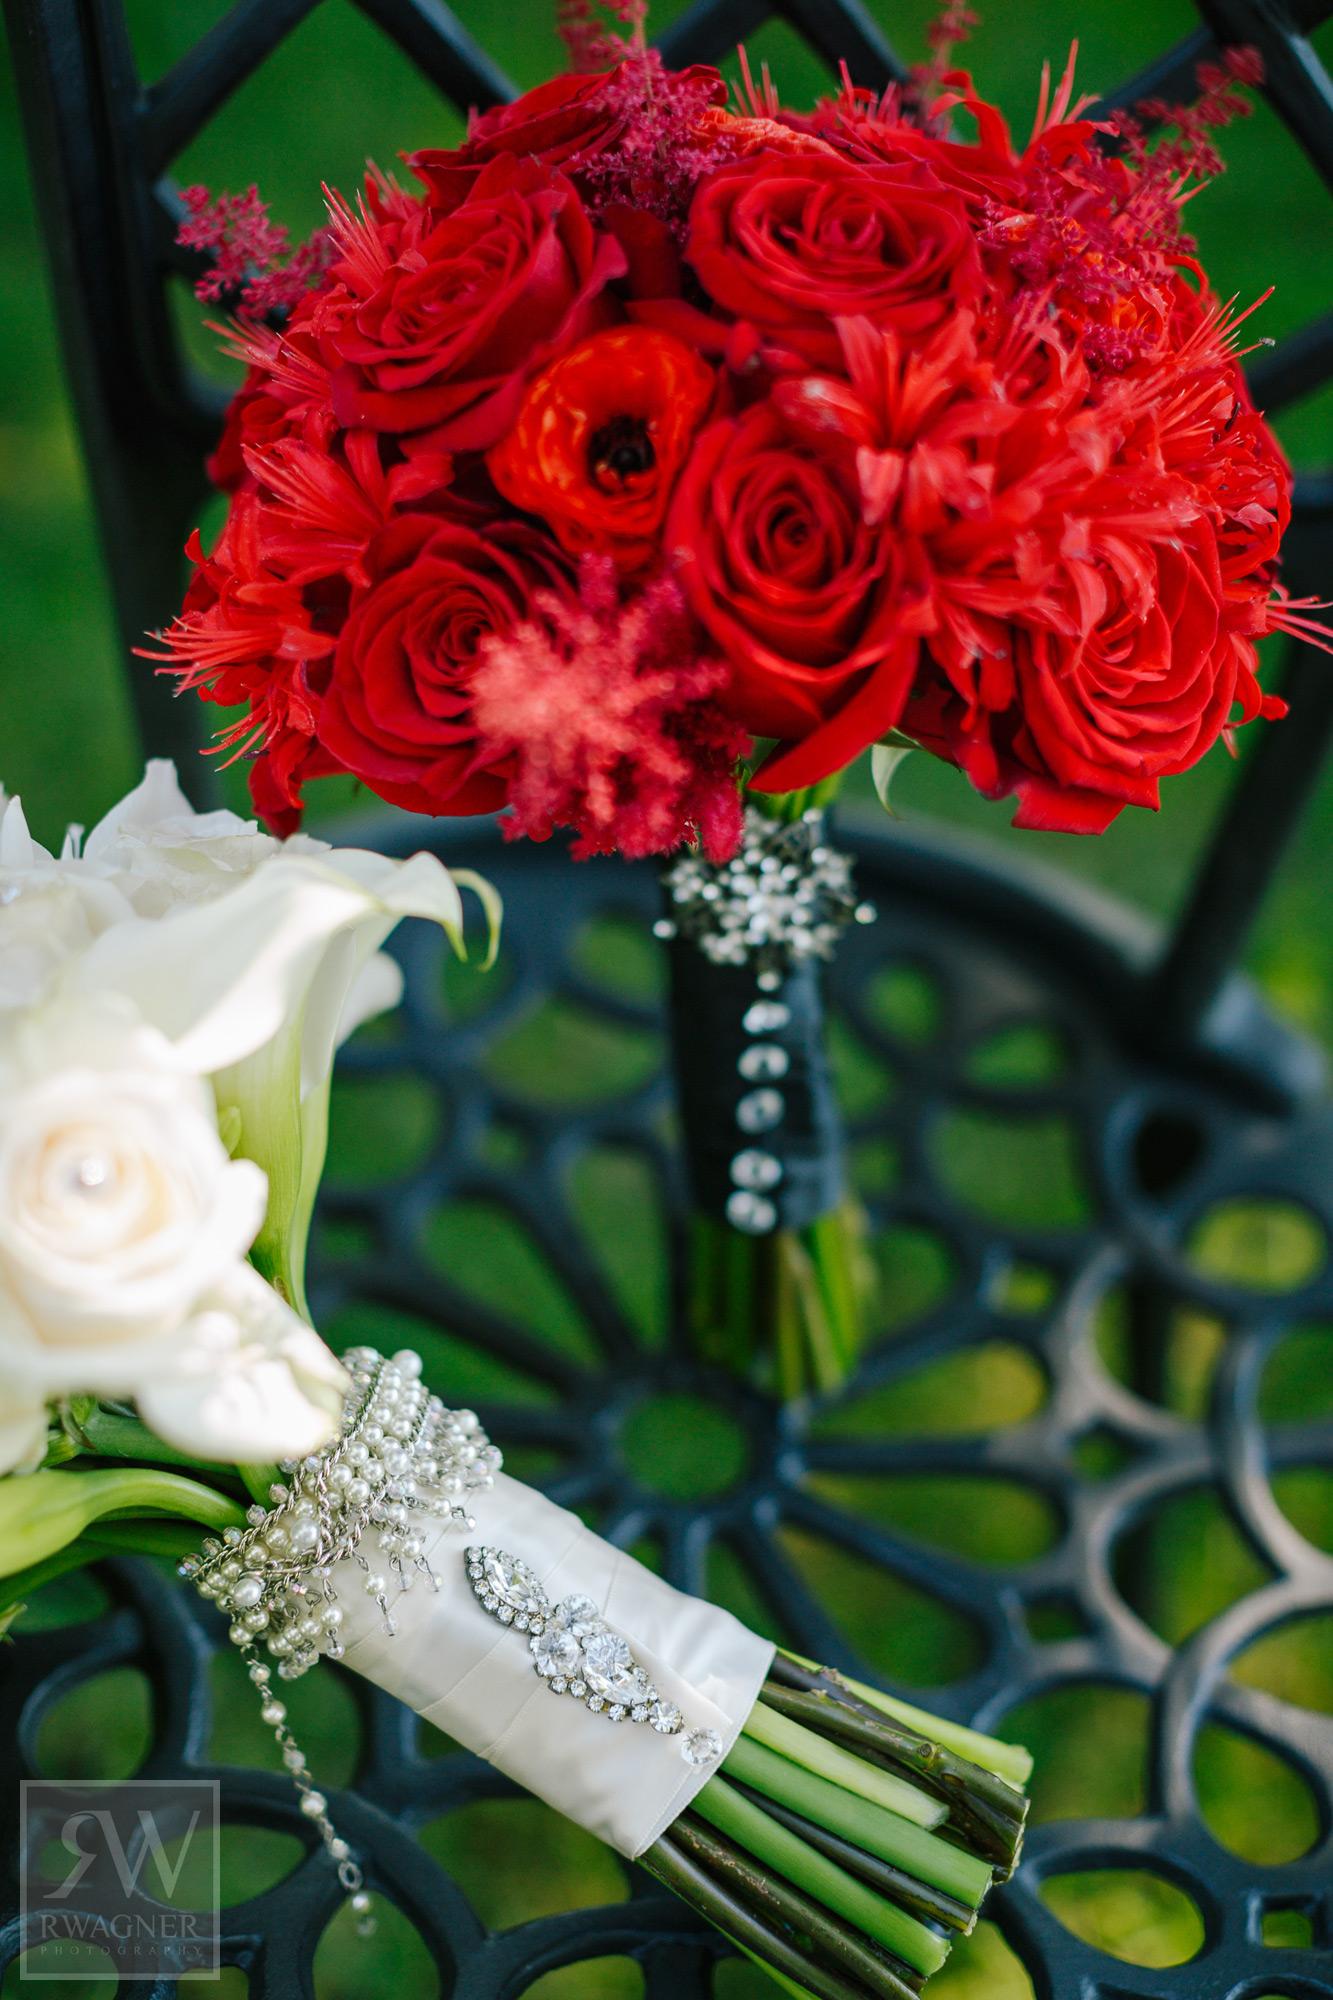 ceci_new_york_luxury_wedding_invitations_couture_red_black_white_real_wedding_dramatic_inn_at_longshore_v286_13.jpg